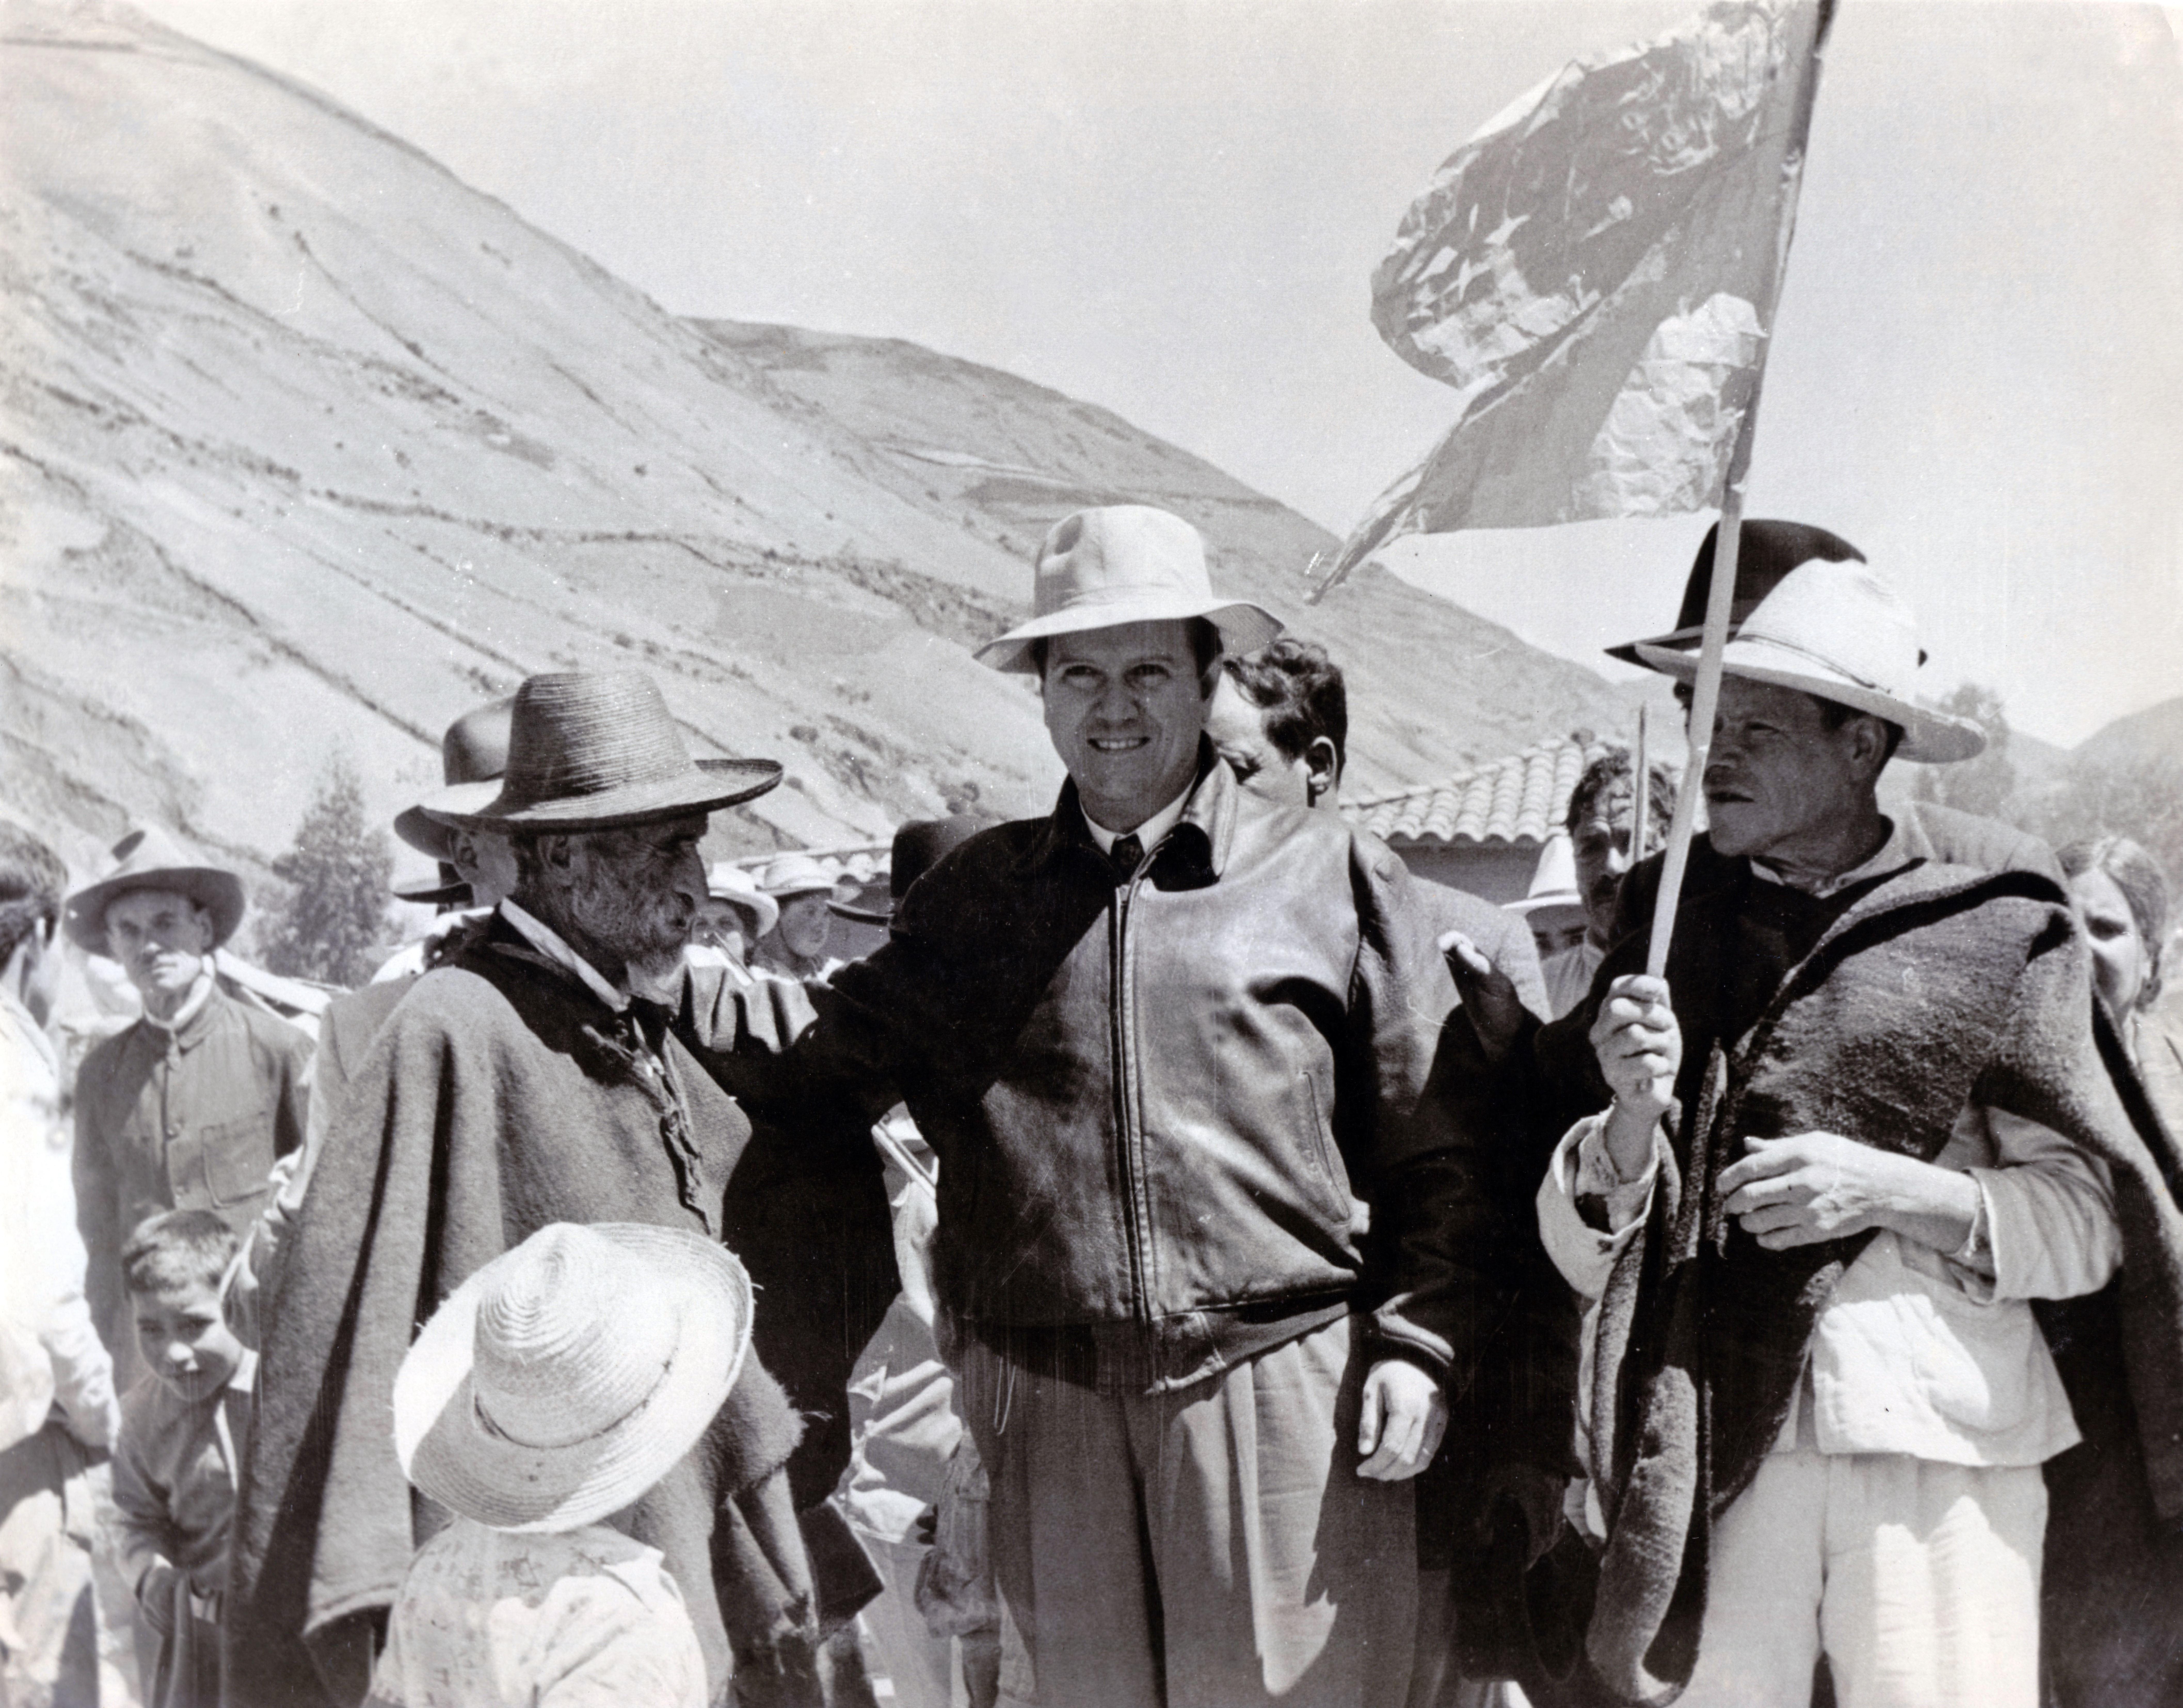 Rondón Nucete, Jesús. Rafael Caldera, Merideño integral (1981)